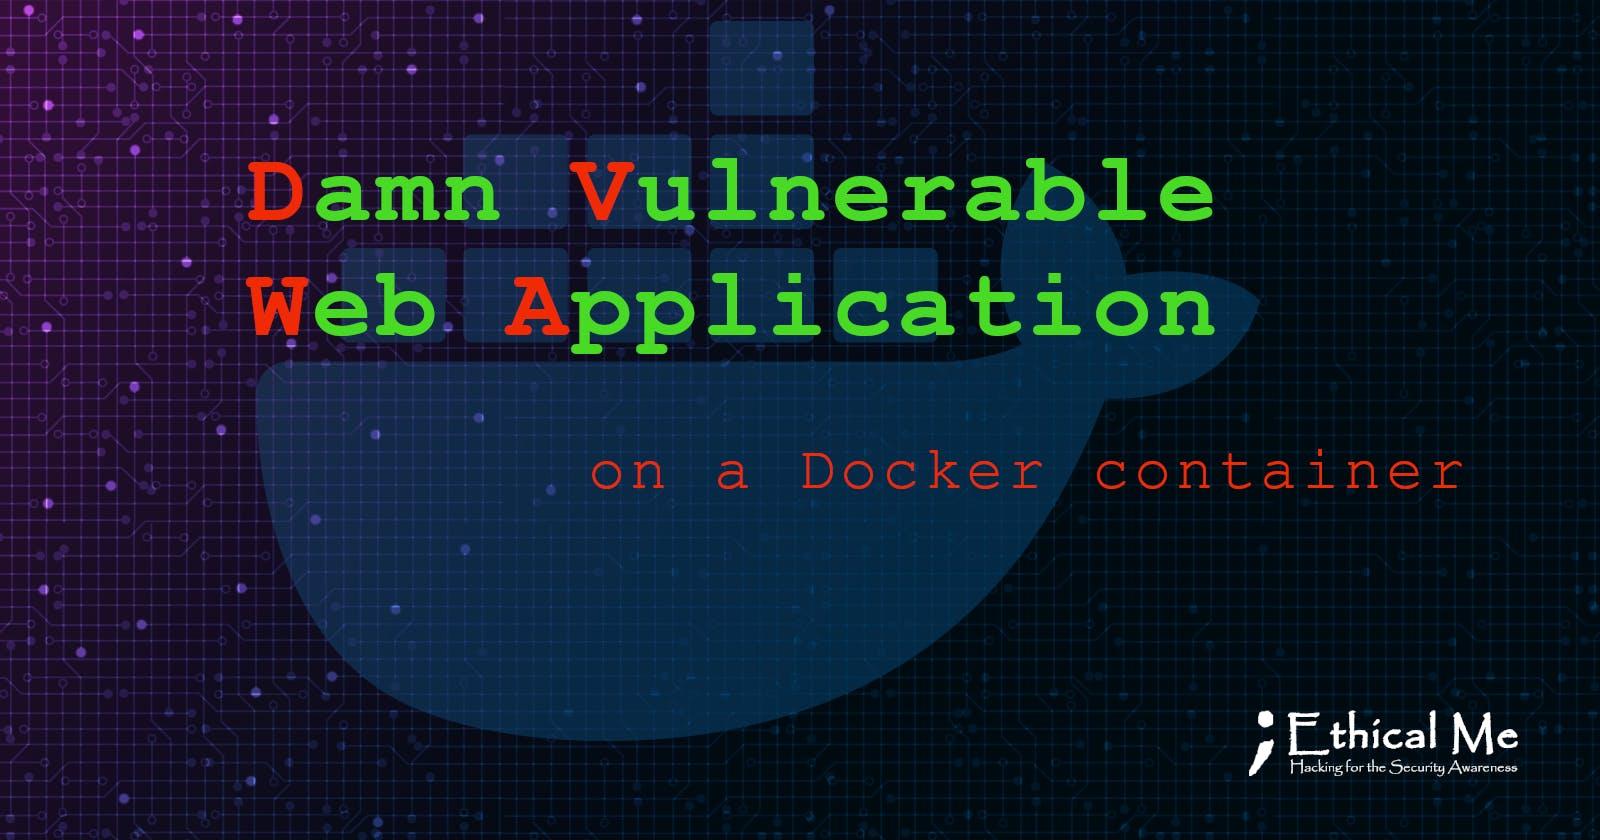 Run Damn Vulnerable Web Application (DVWA) from a Docker container